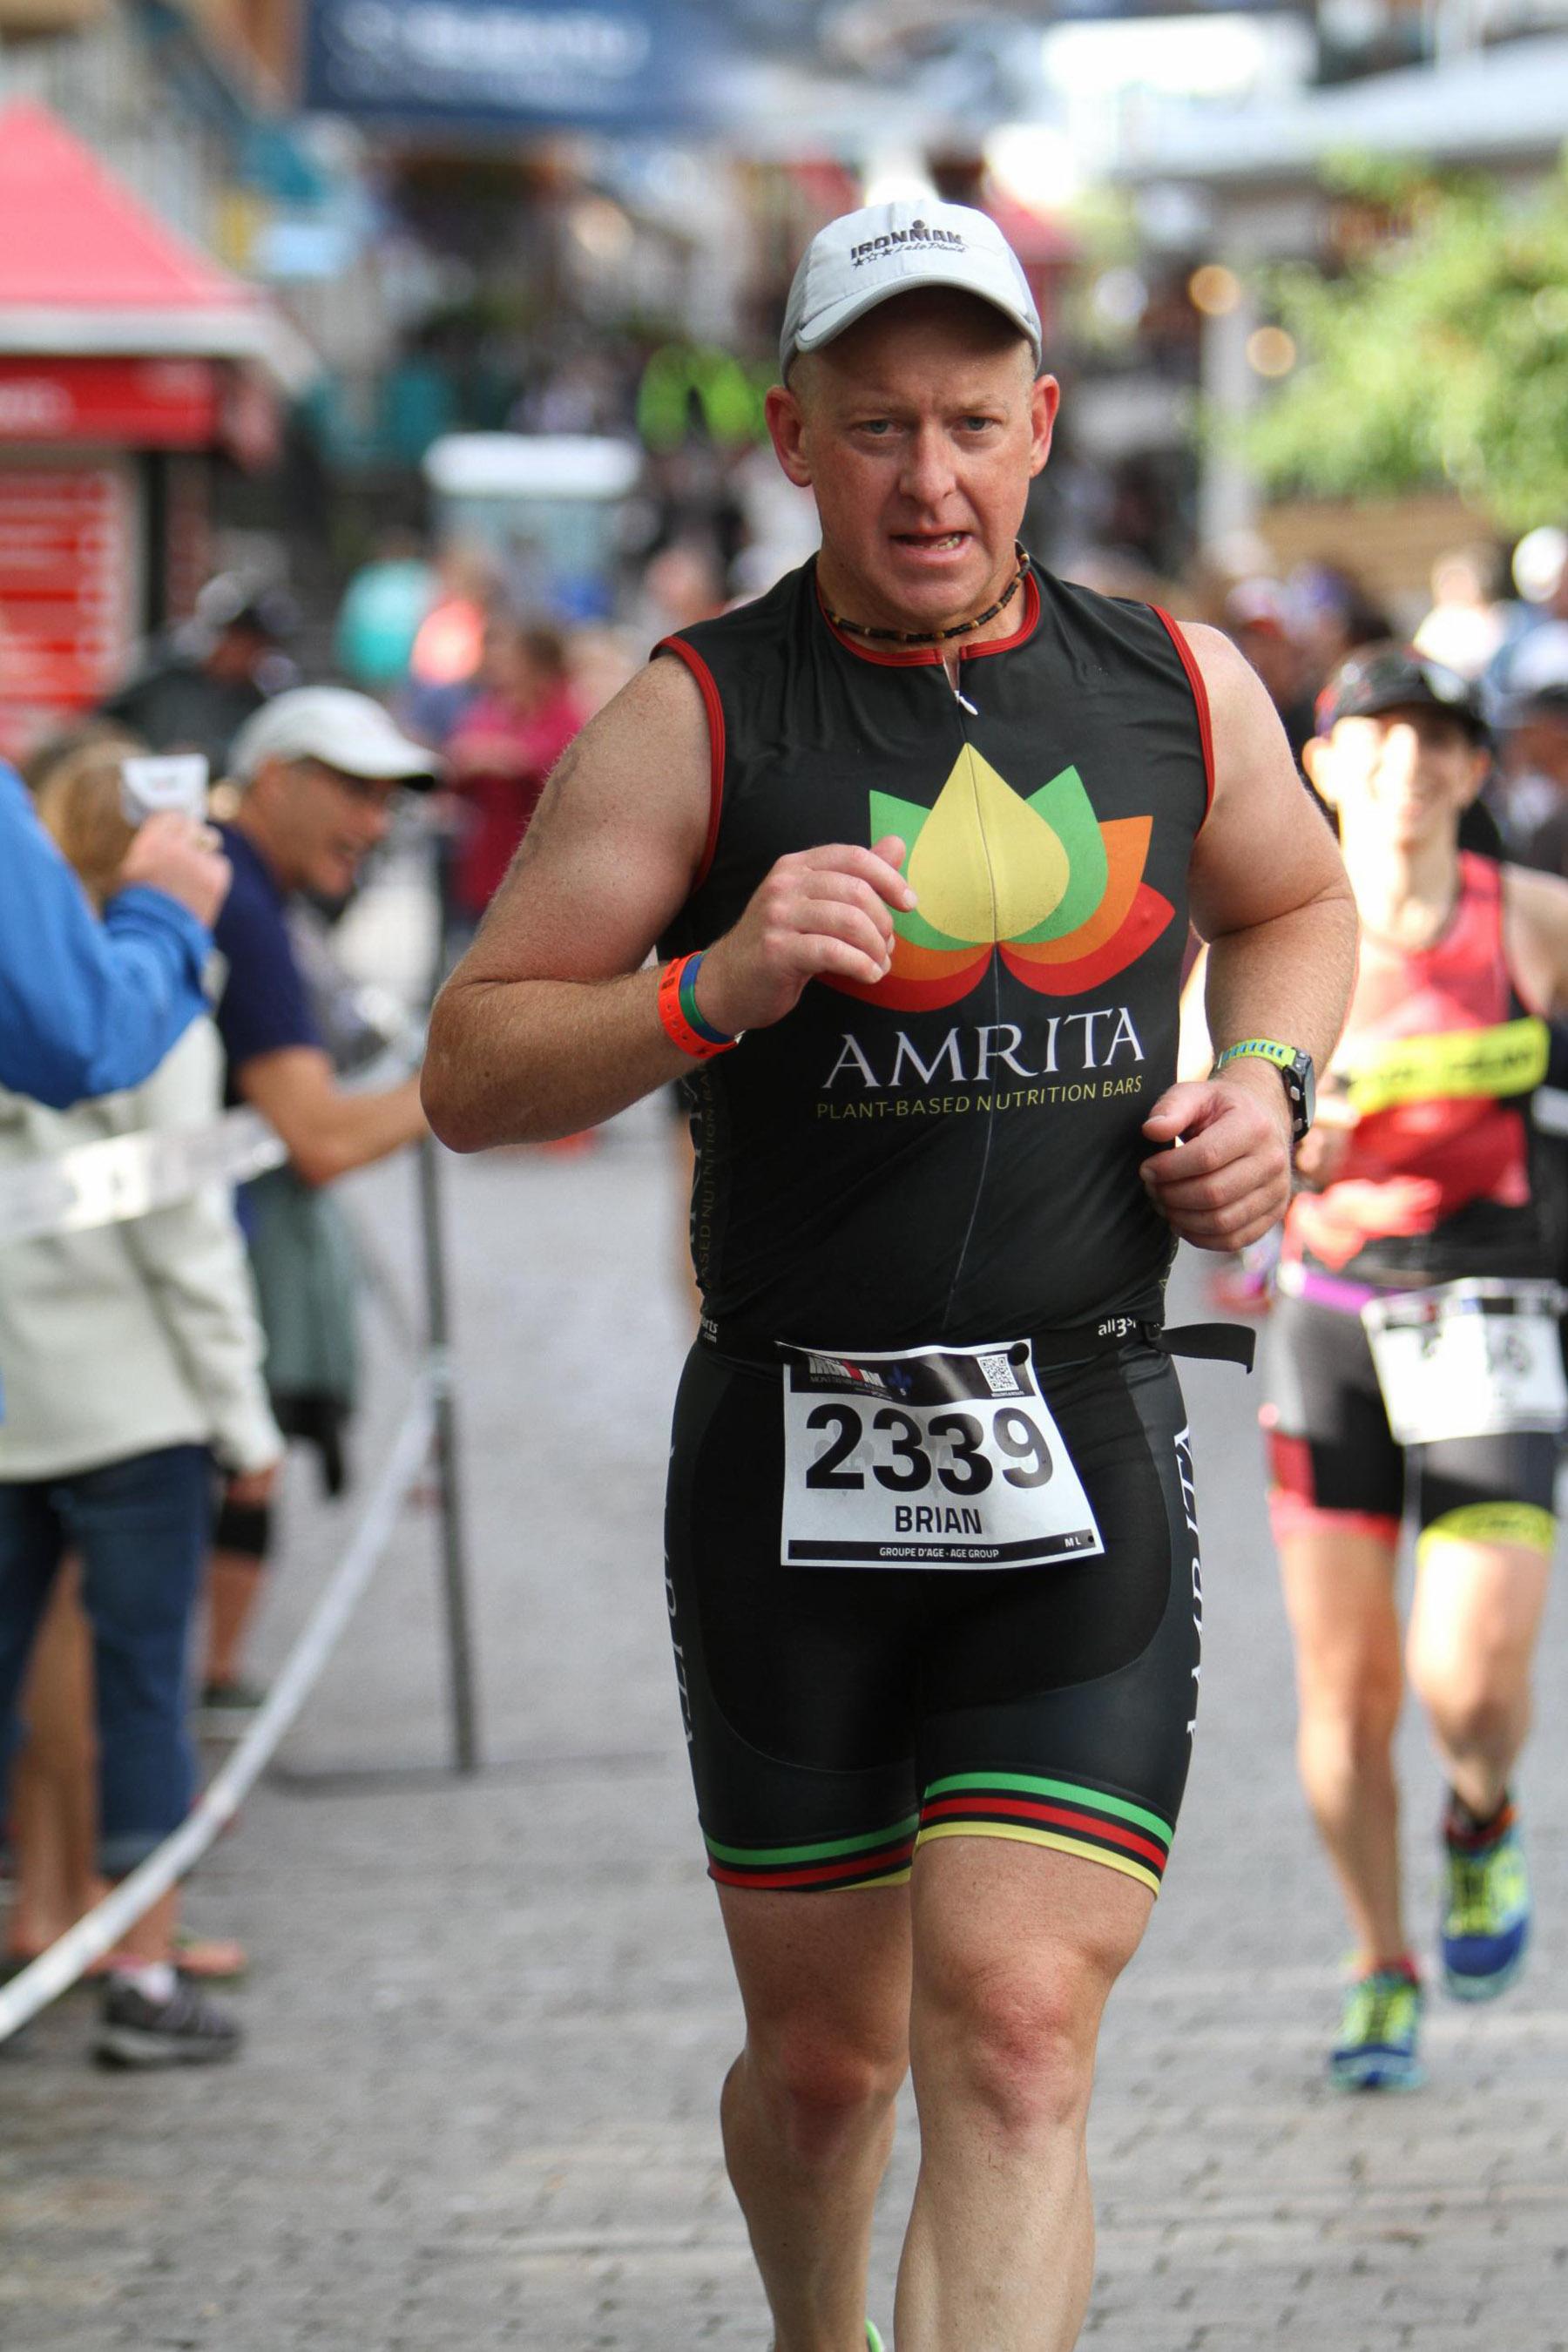 Ironman Mont-Tremblant 2016 - Heading towards the finish line!